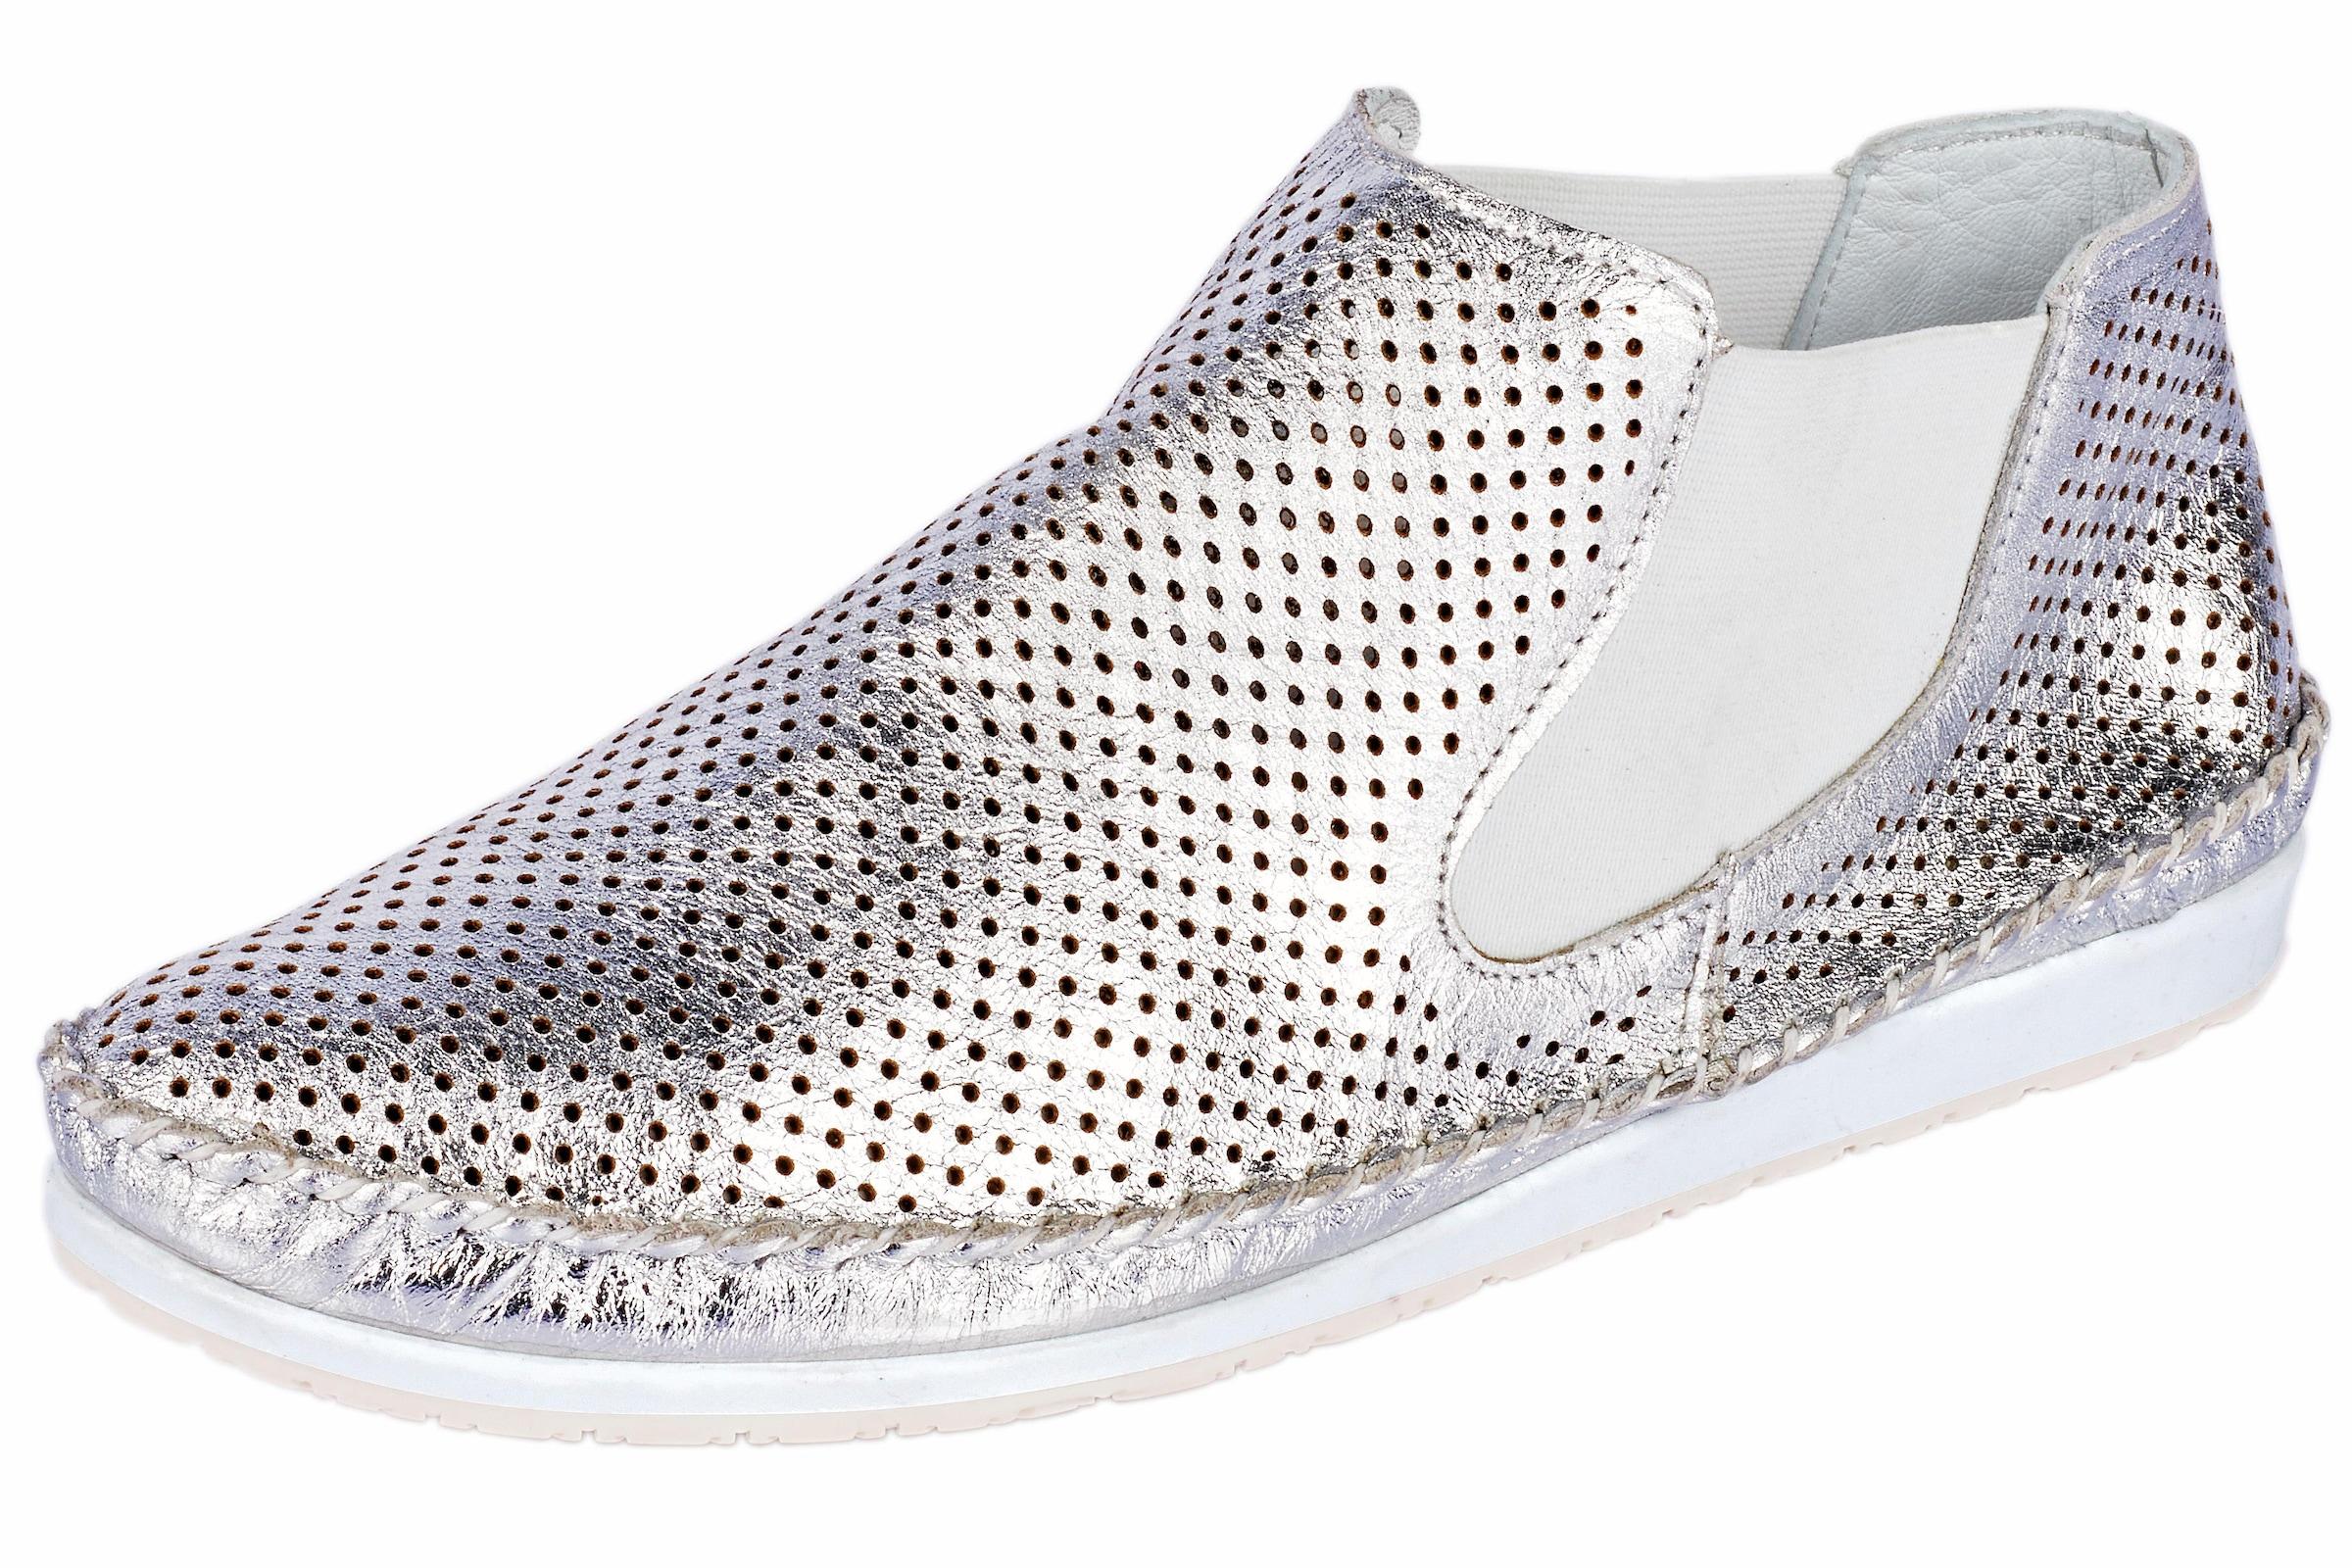 ANDREA CONTI Kurzstiefelette Verschleißfeste billige Schuhe